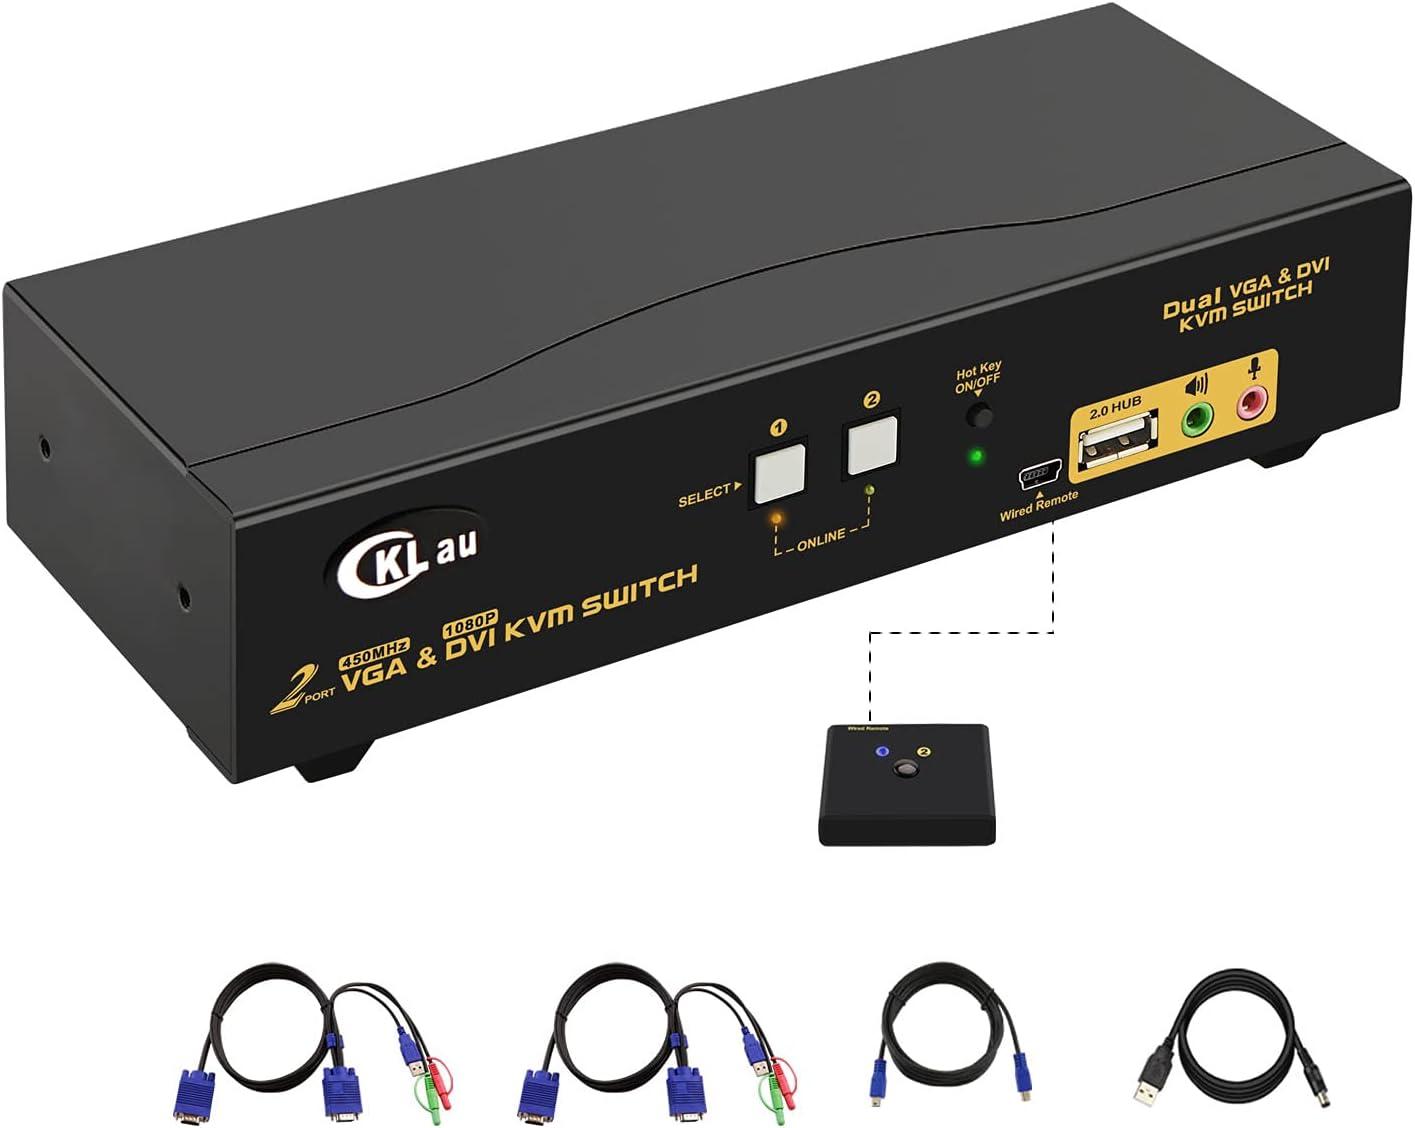 CKLau 2 Port Dual Monitor KVM DVI + VGA Extended Display with Audio, Microphone, USB 2.0 Hub and 2pcs 4ft KVM Cables